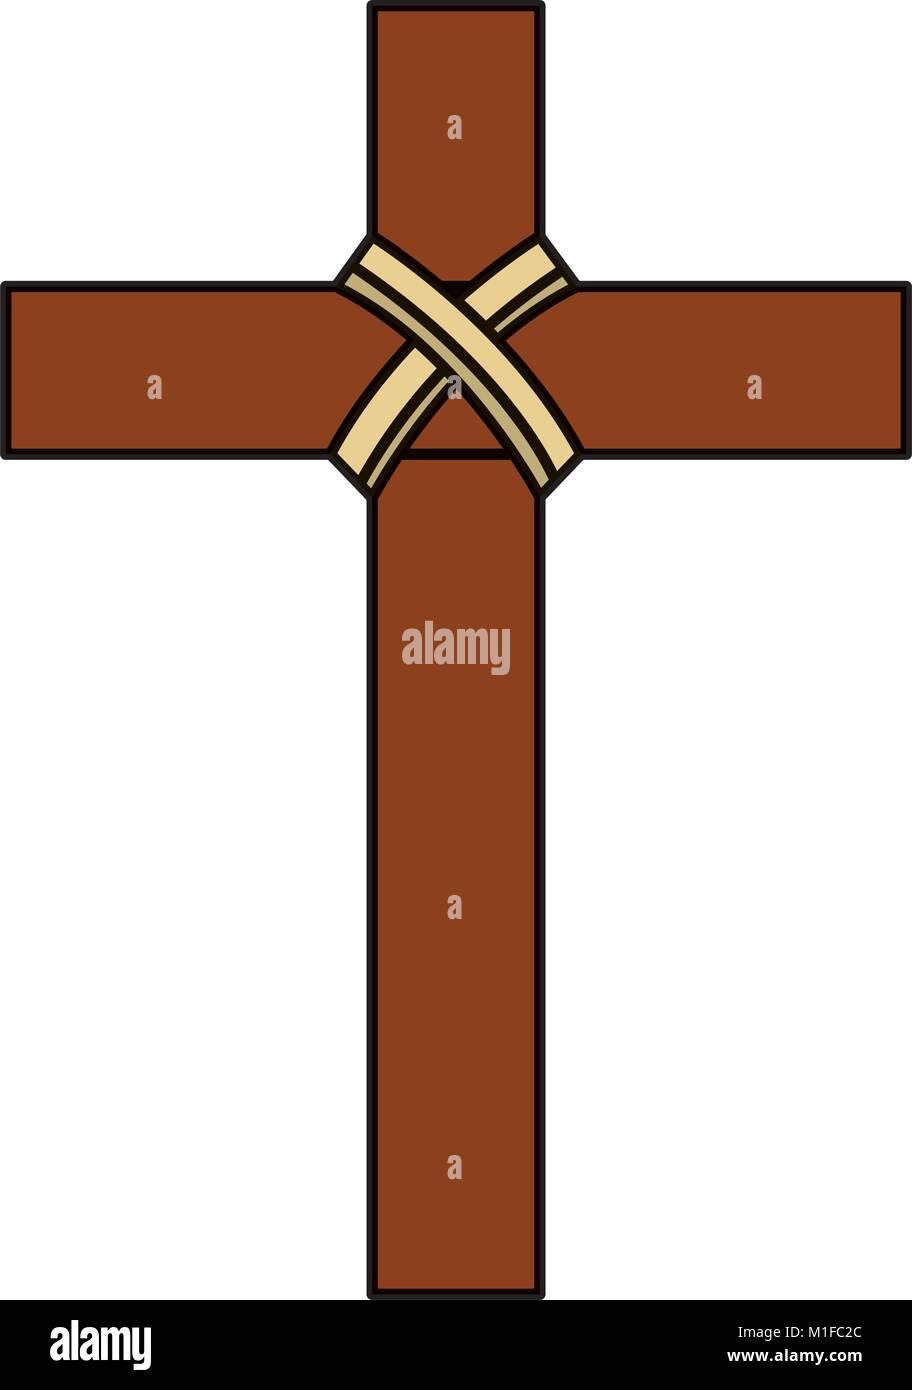 Religious wooden cross christianity symbol stock vector art religious wooden cross christianity symbol biocorpaavc Gallery